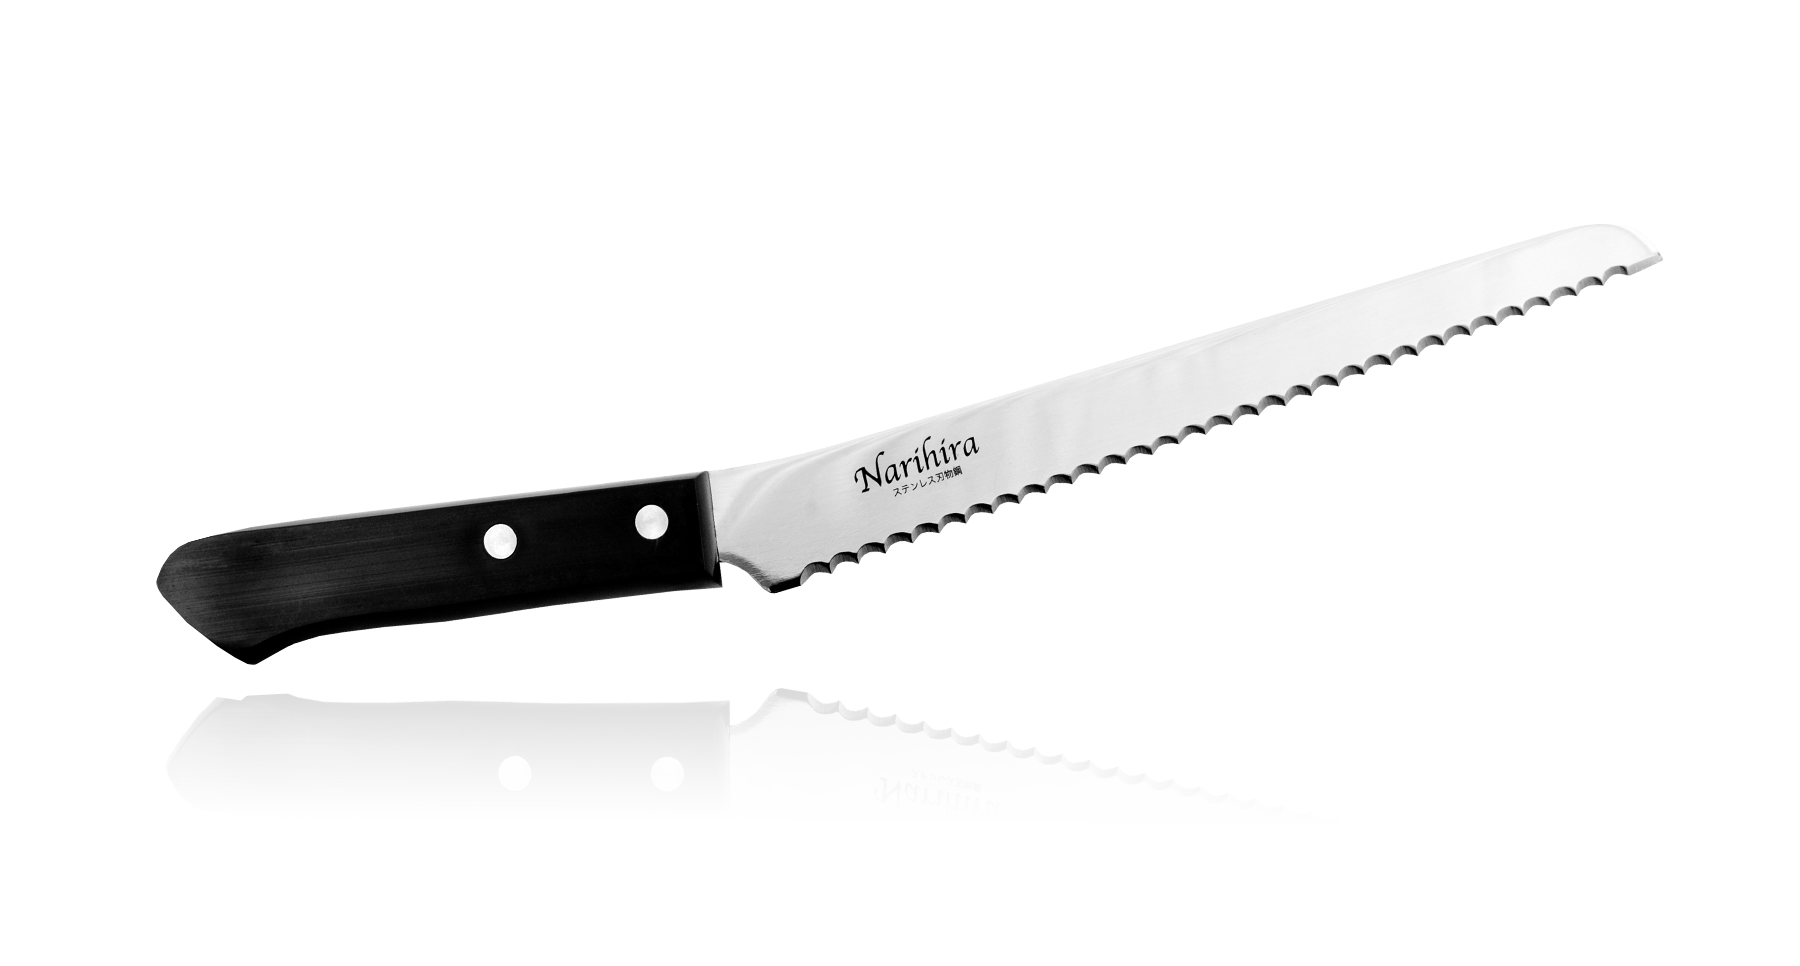 все цены на Нож для нарезки хлеба Narihira, Tojiro, 200 мм, сталь AUS-8 онлайн